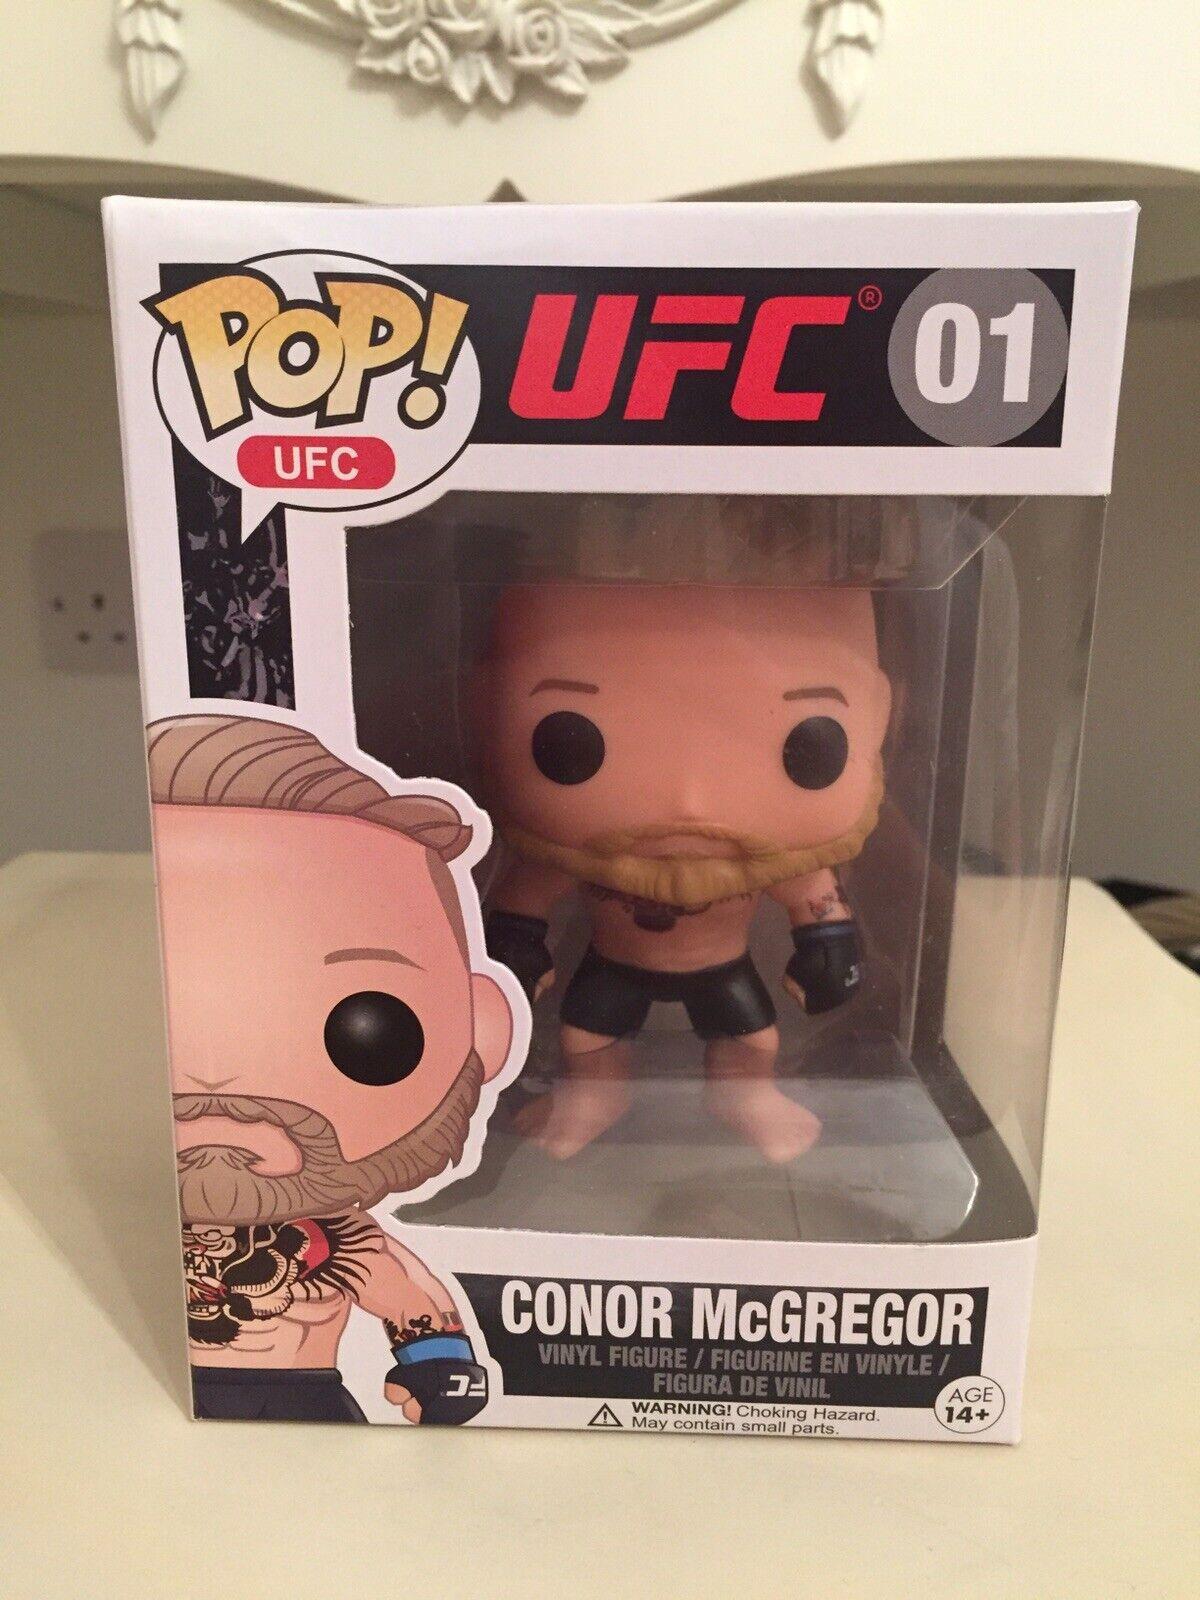 Black Shorts 01 UFC: Conor McGregor Funko Pop Pop UFC Vaulted